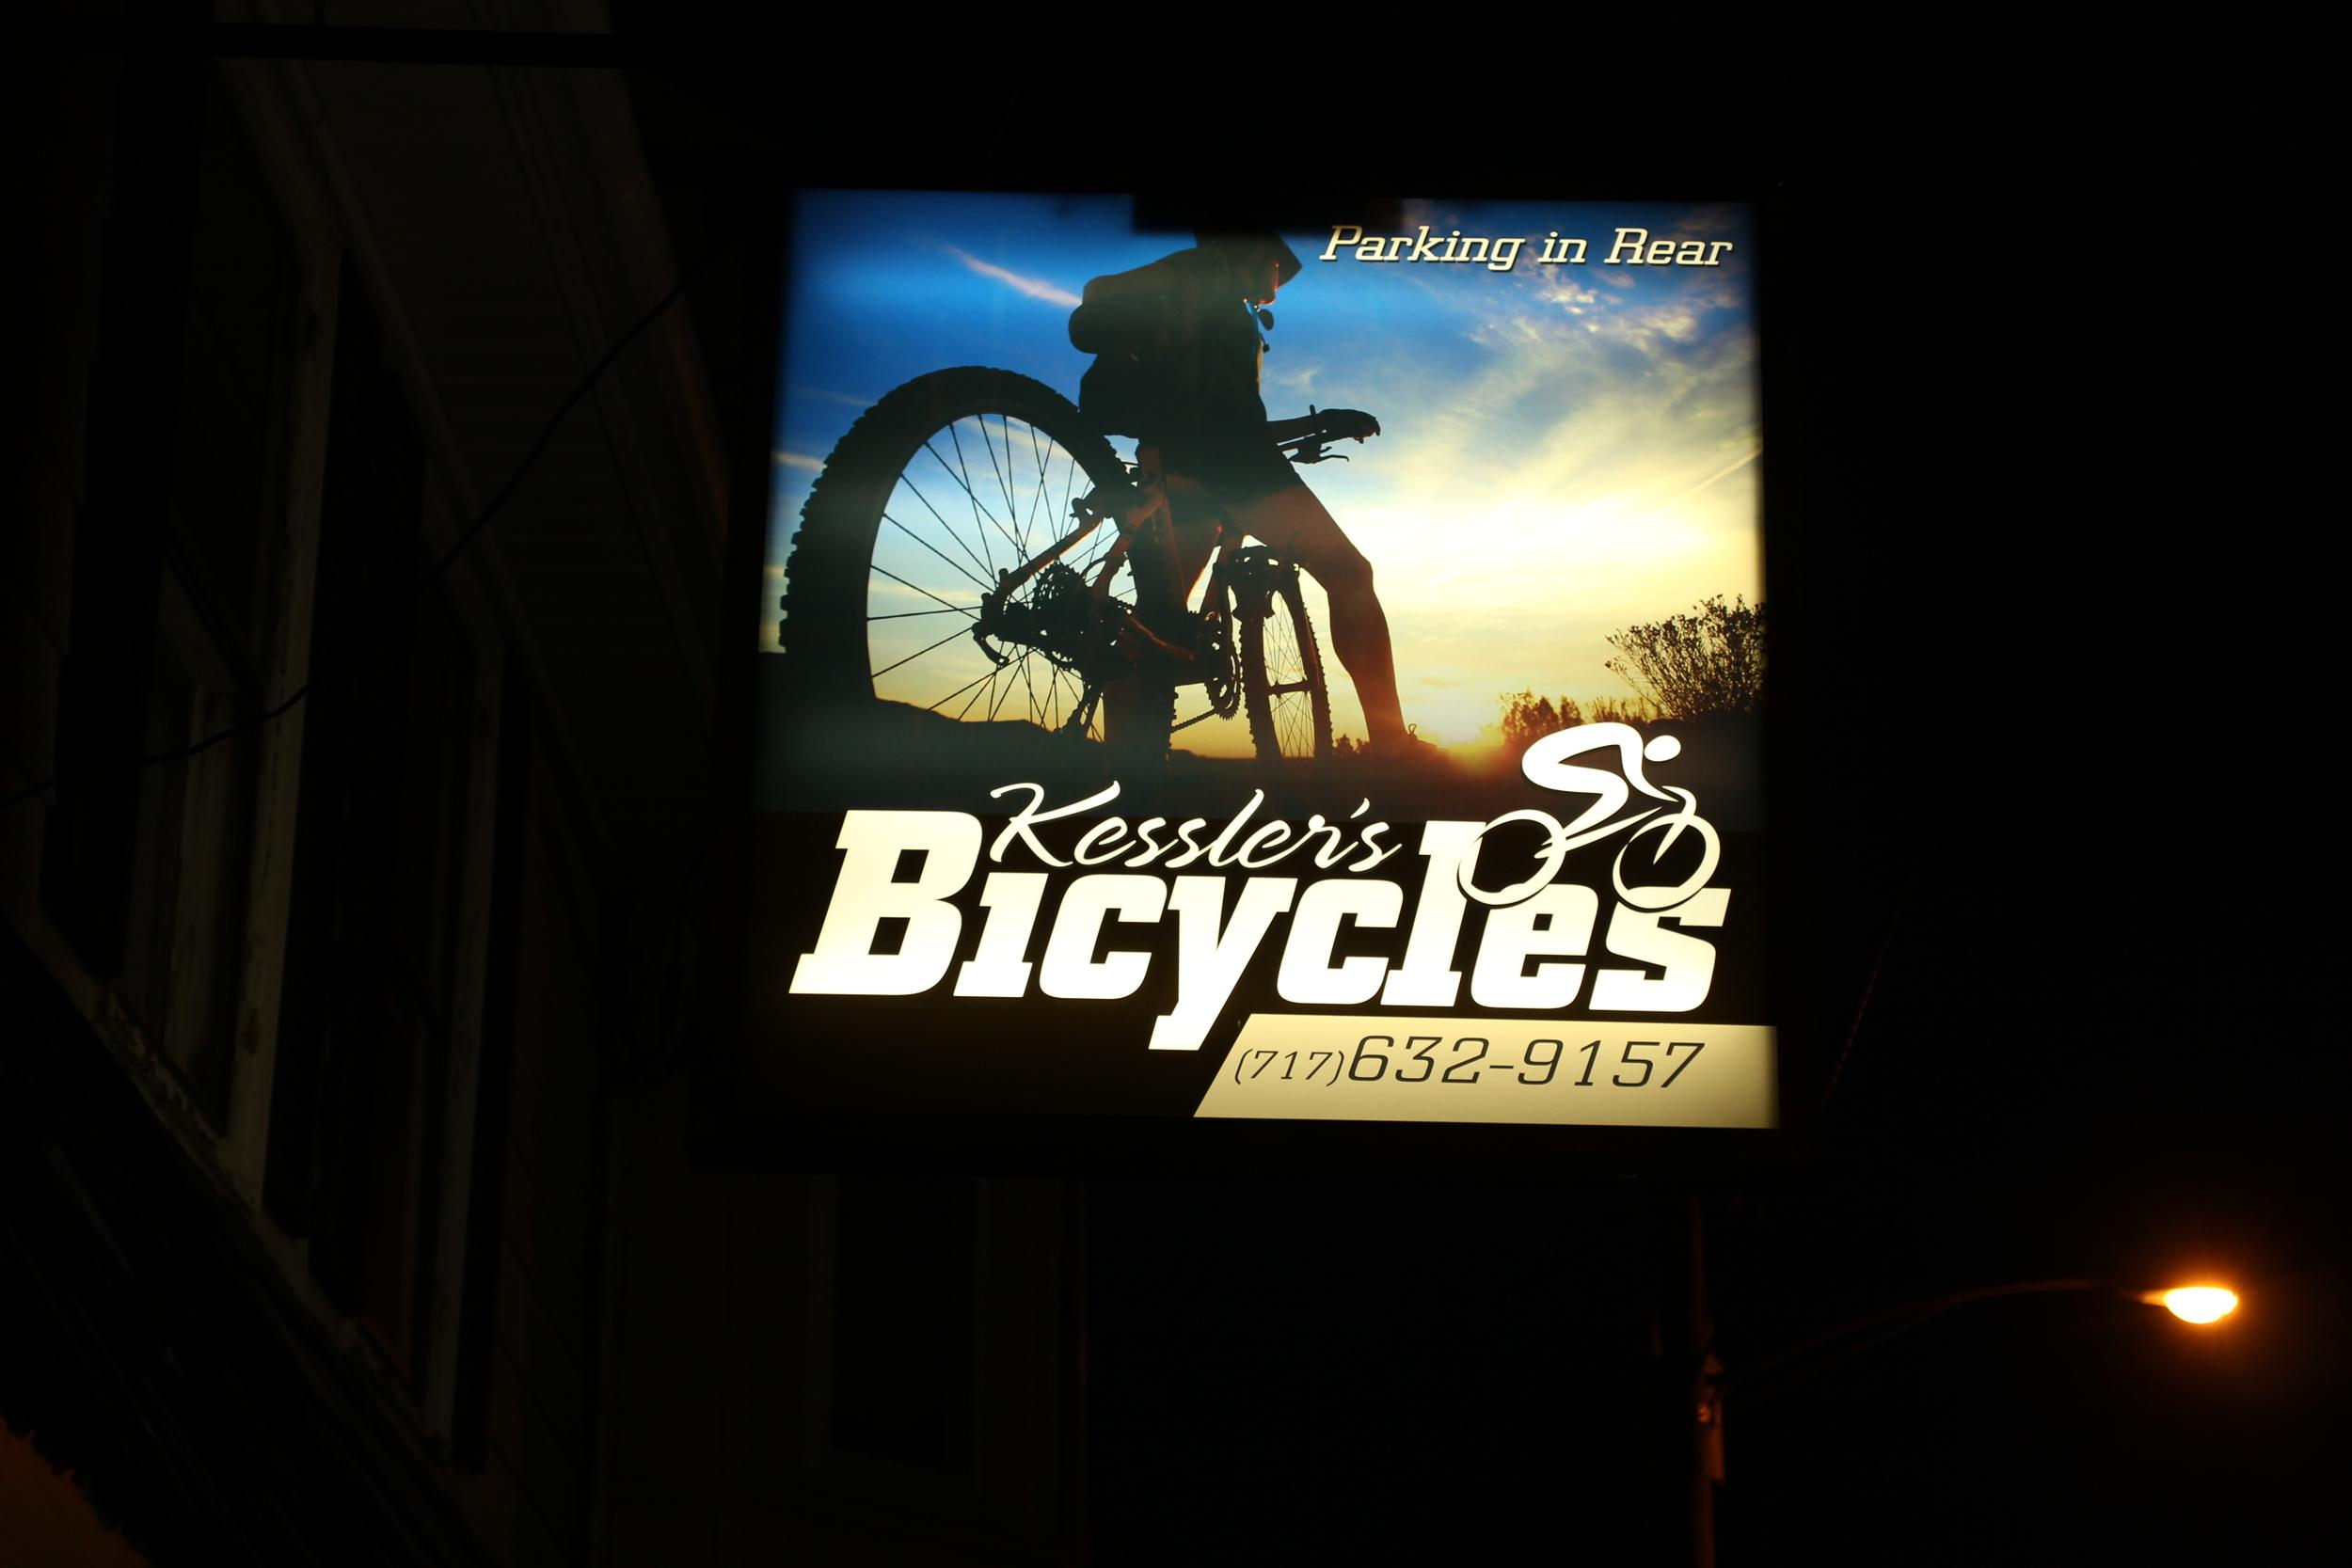 Signs | Kessler's Bicycles Sign | Hanover, PA